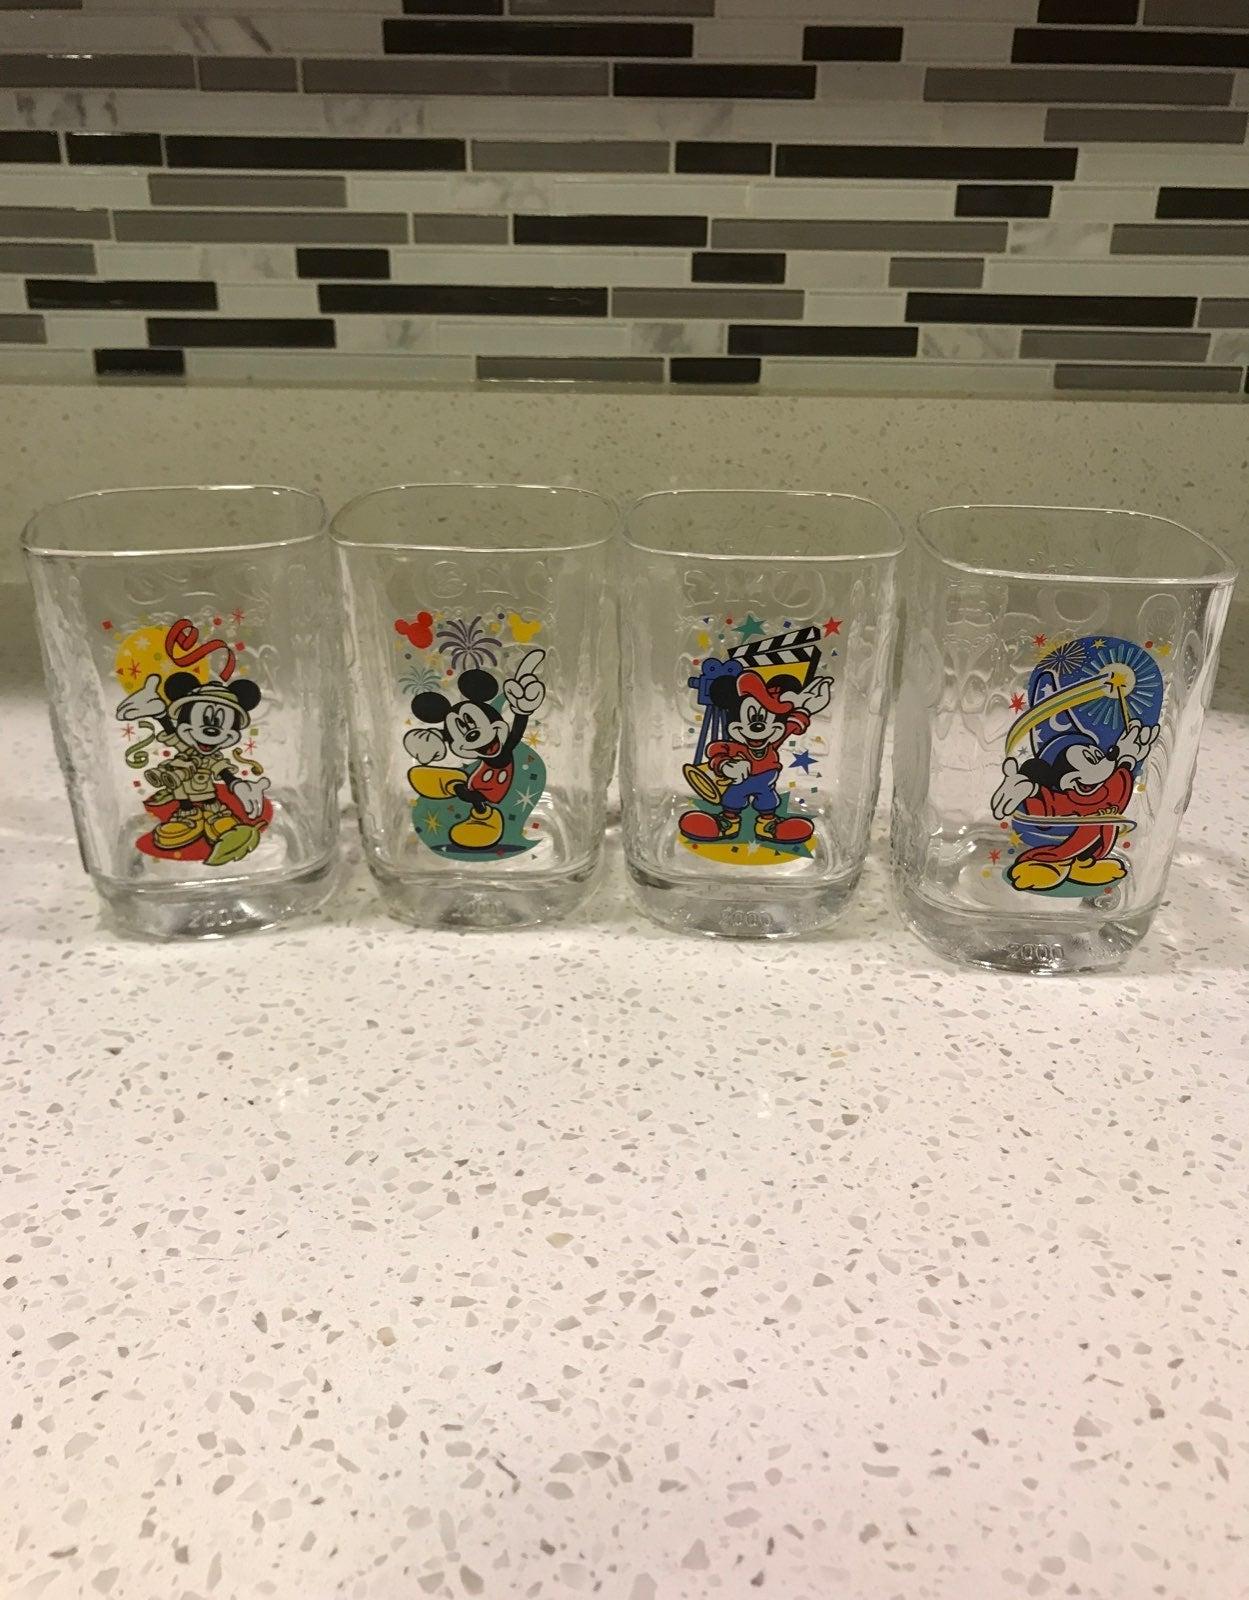 McDonalds Mickey Mouse Walt Disney Cups